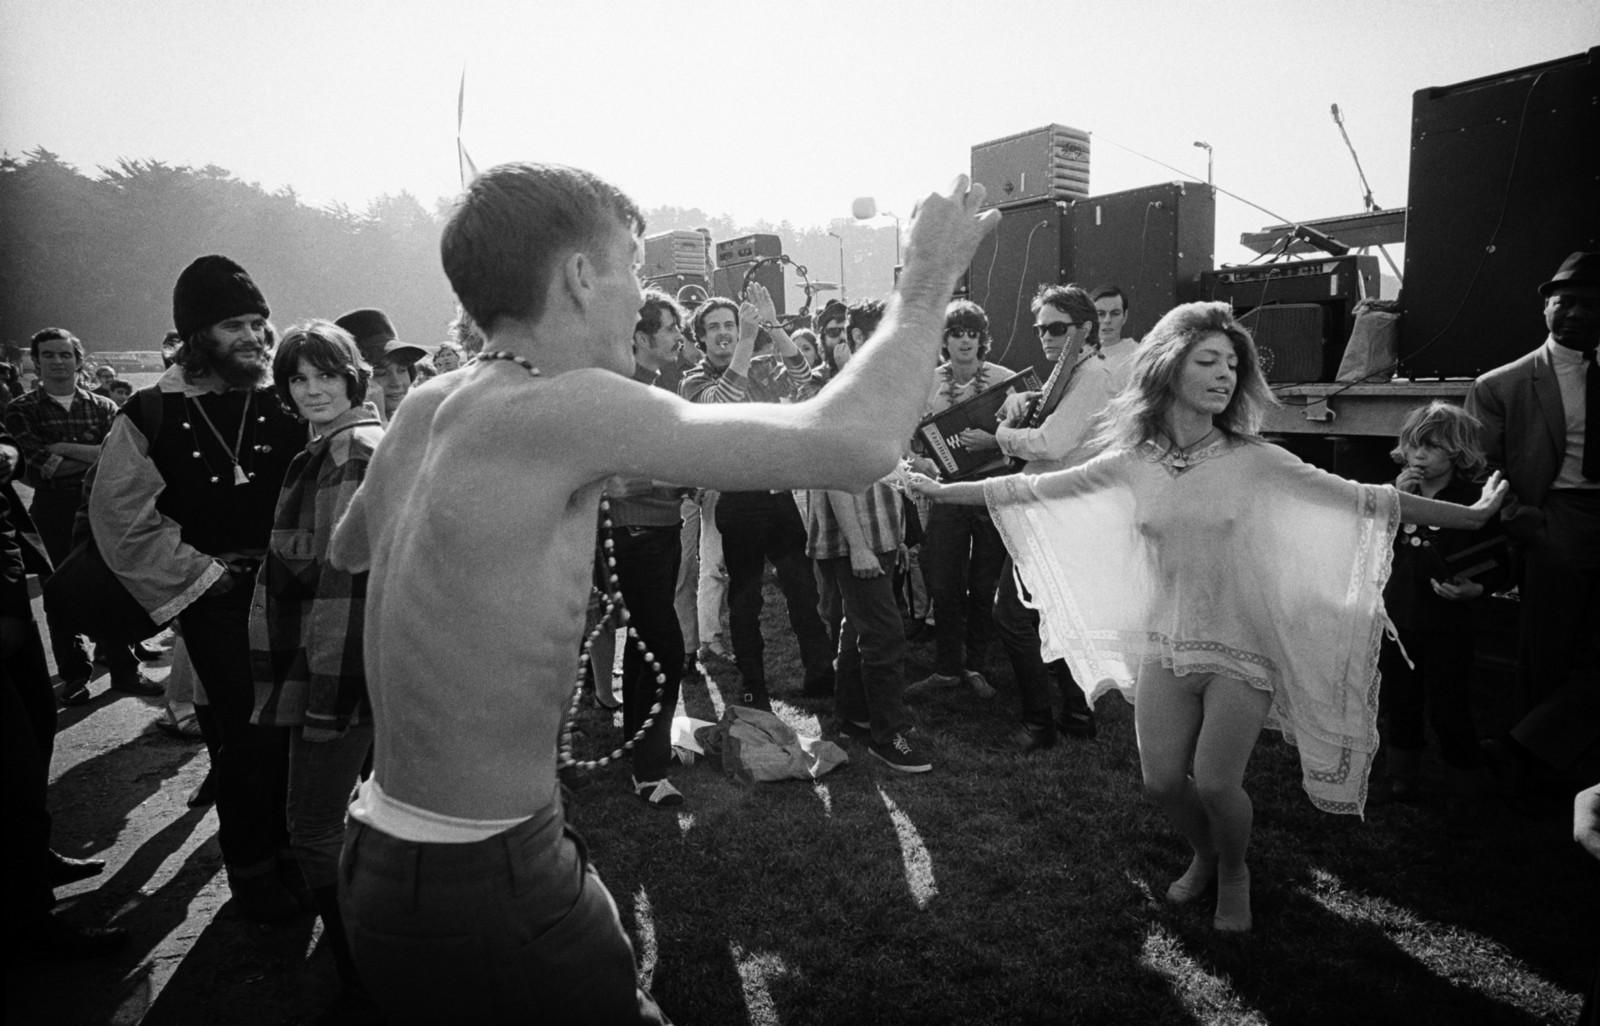 1967. Танцующие хиппи. Парк «Золоты́е воро́та», 14 января